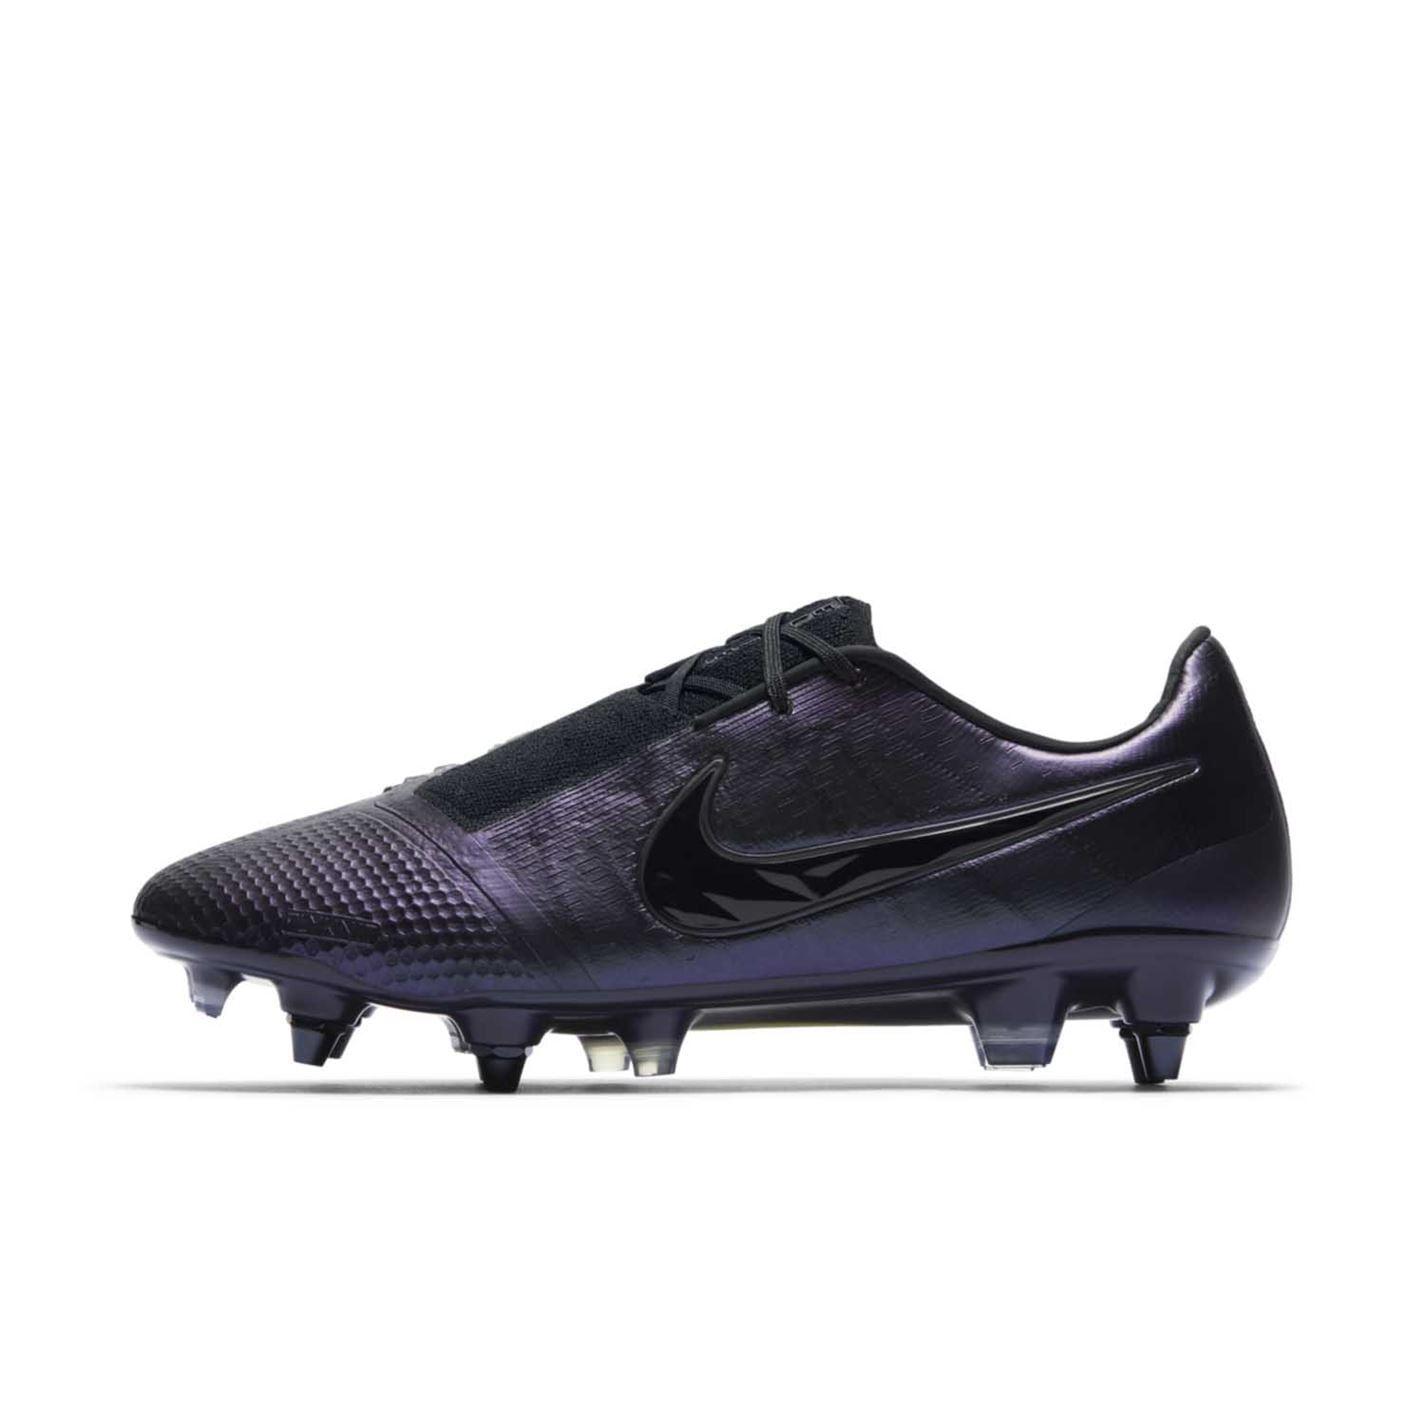 Nike-Phantom-Venom-Elite-Homme-SG-Terrain-Souple-Chaussures-De-Football-Chaussures-de-foot-crampons miniature 4